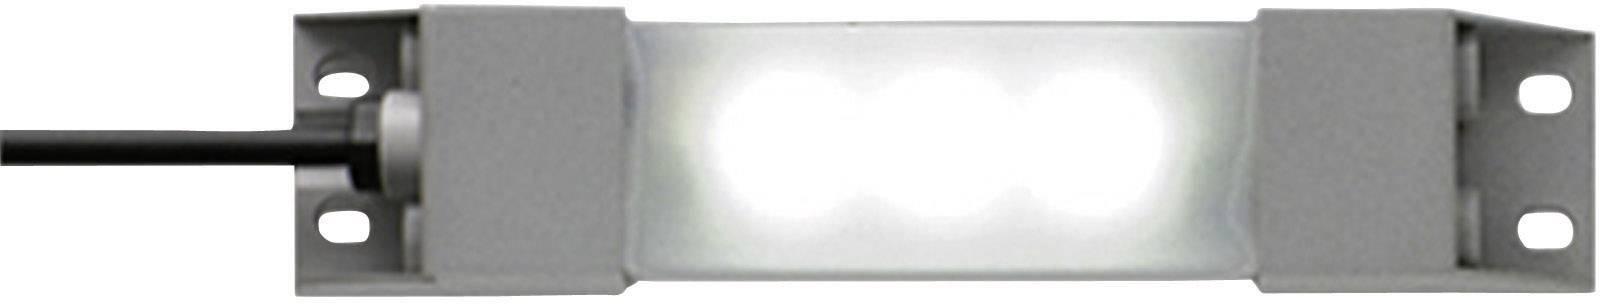 Idec LF1B-NA4P-2THWW2-3M, biela, 60 lm, 1.5 W, 24 V/DC